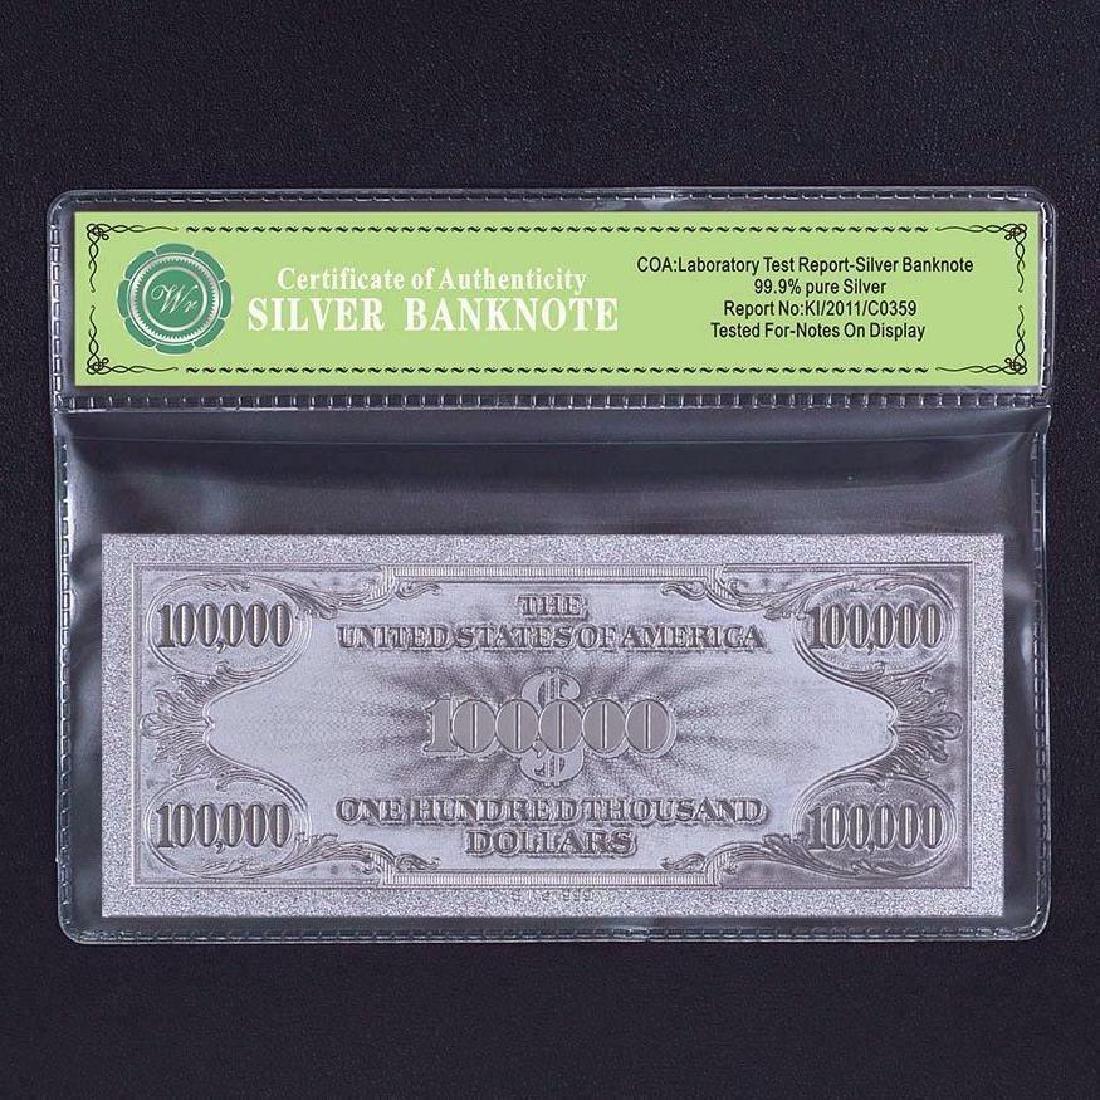 USA $100,000 24K Silver Clad Banknote - 2